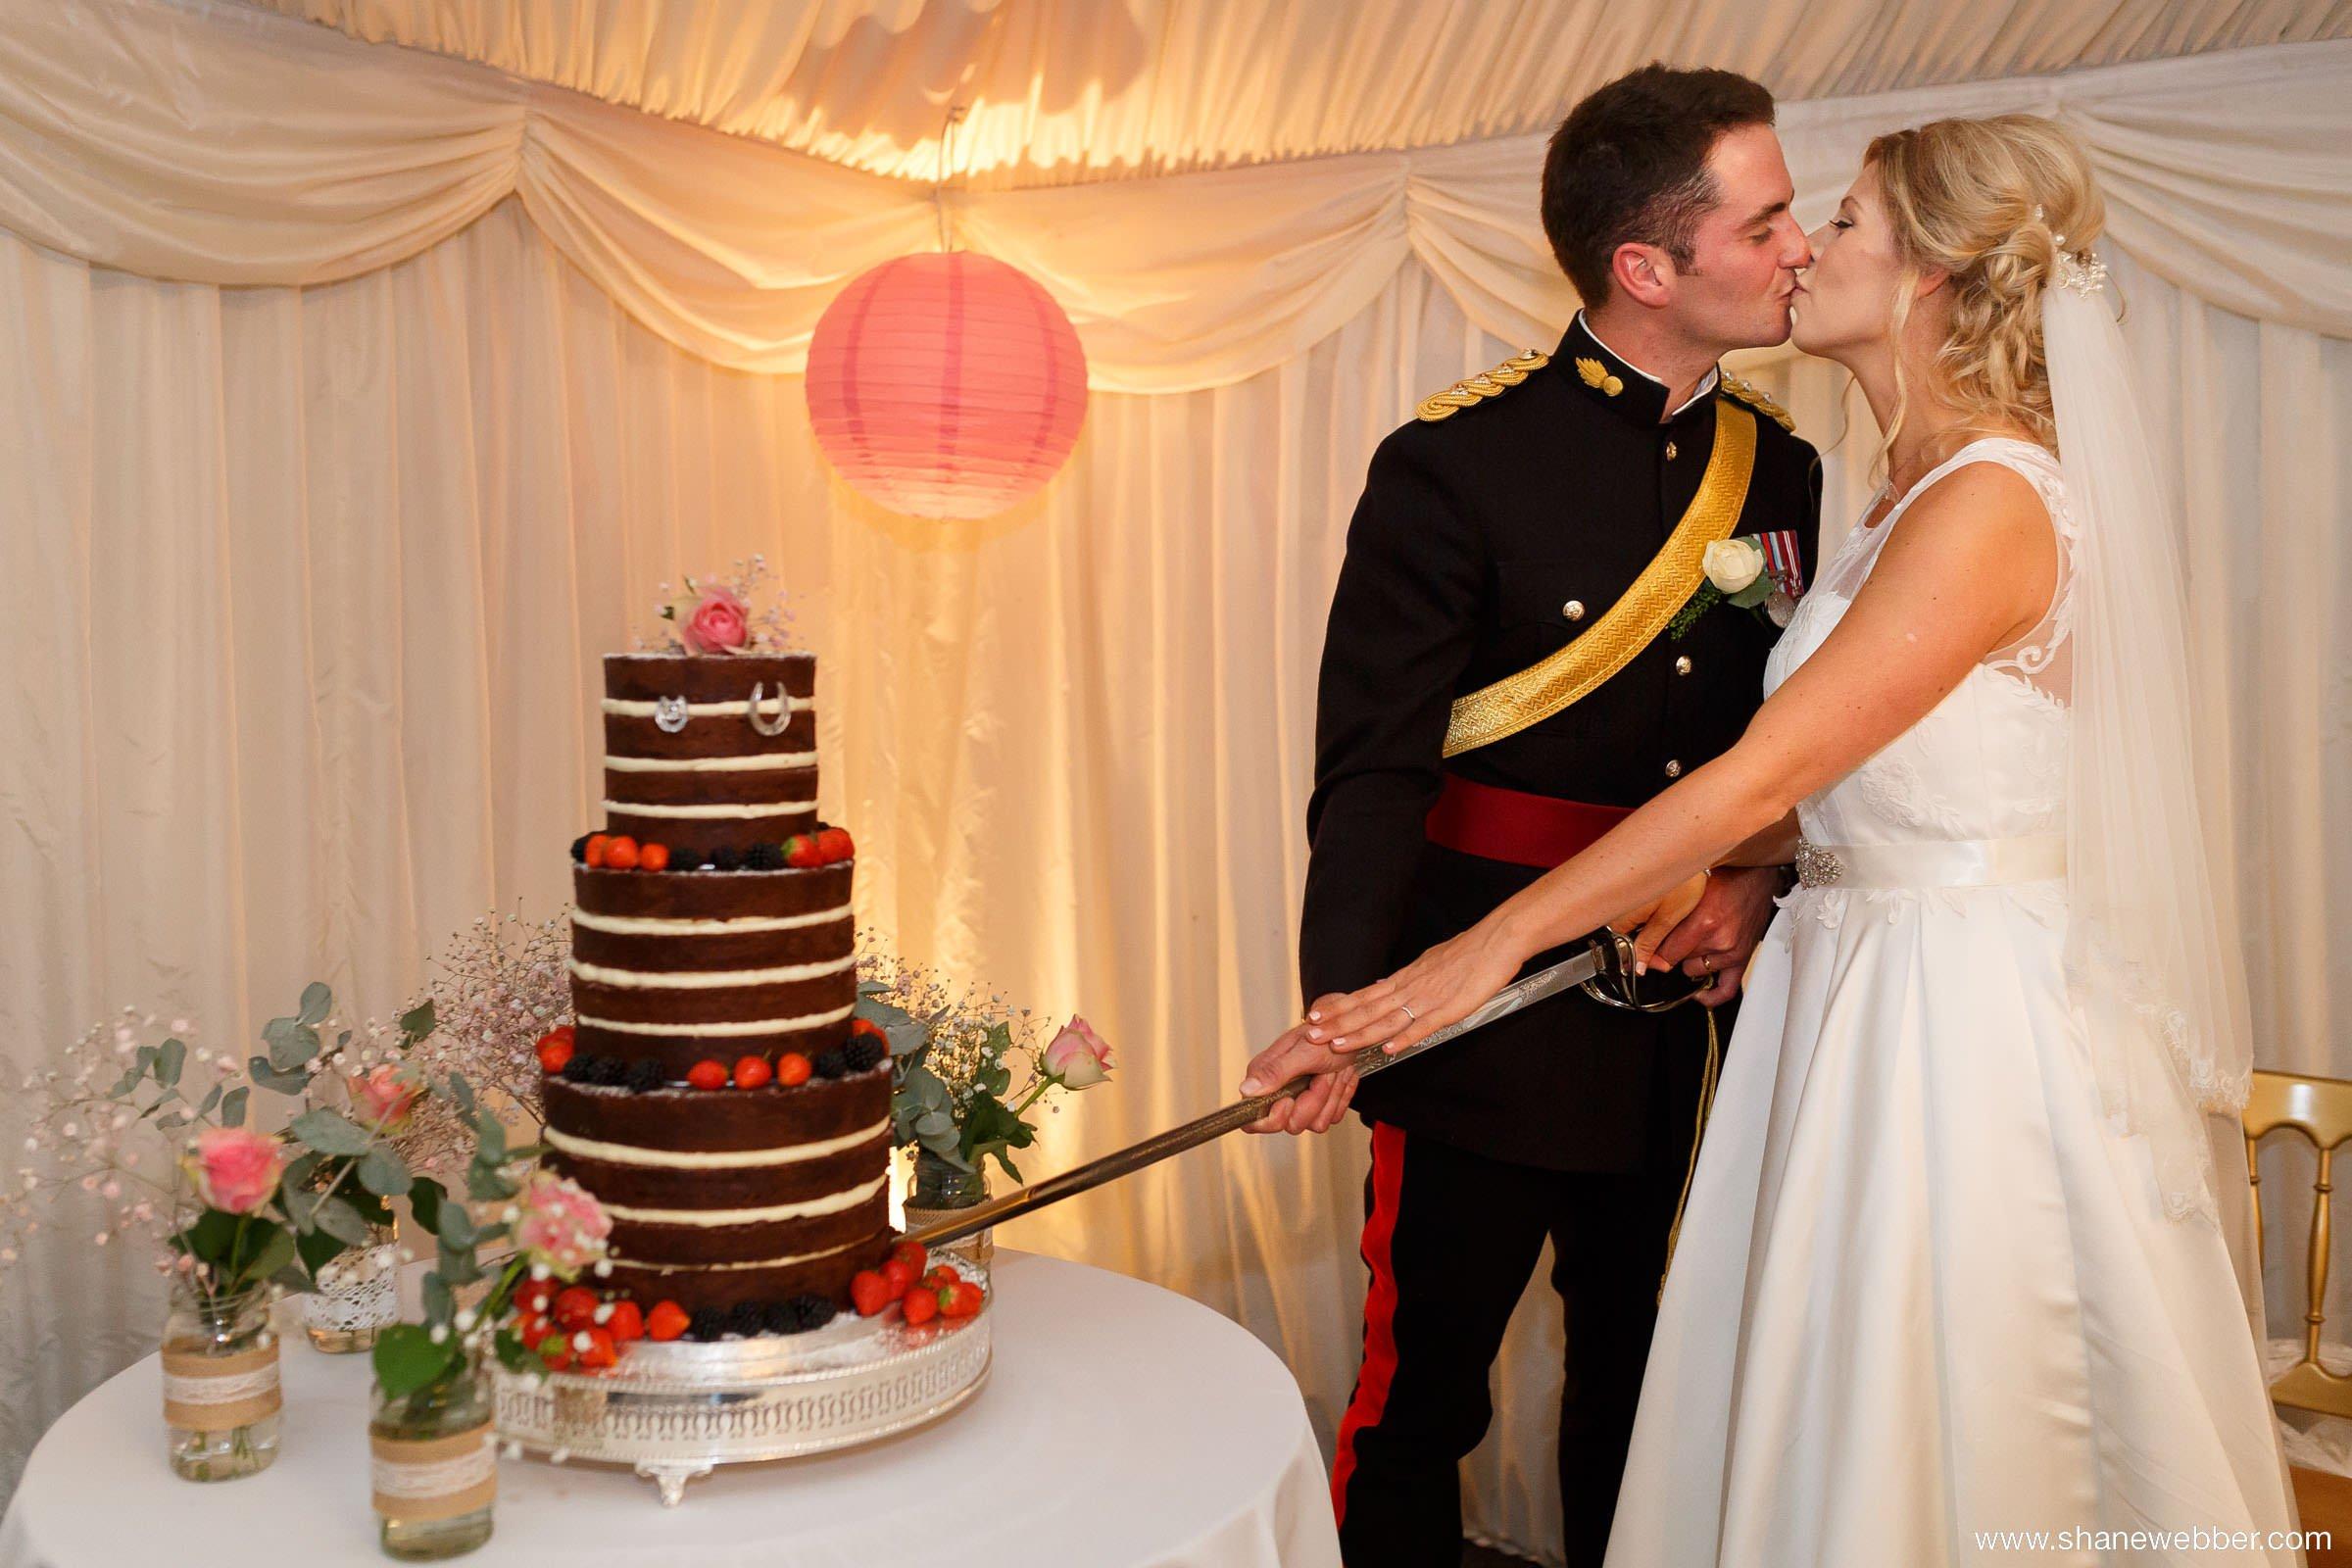 Cutting wedding cake with a sword